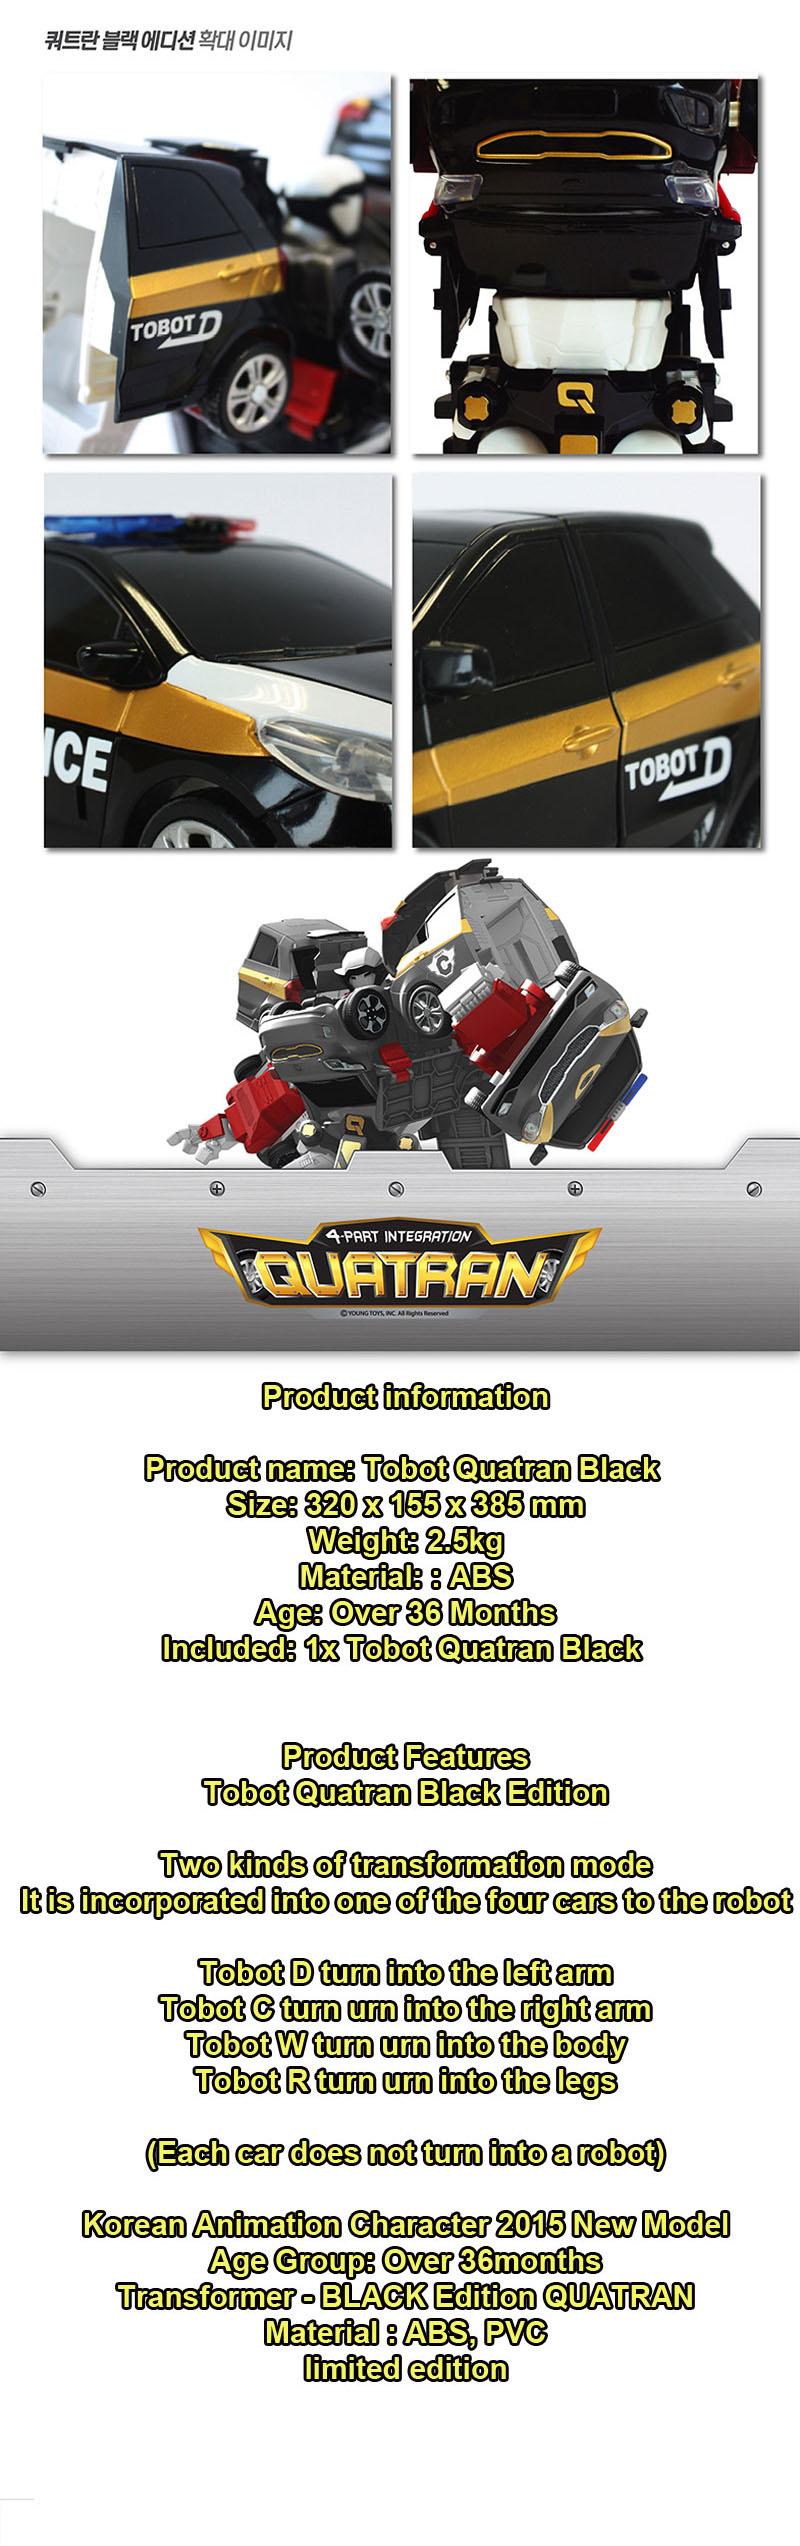 Every Need Want Day Tobot Quatran Https Youtubecom Watchv5bc8yetotkg